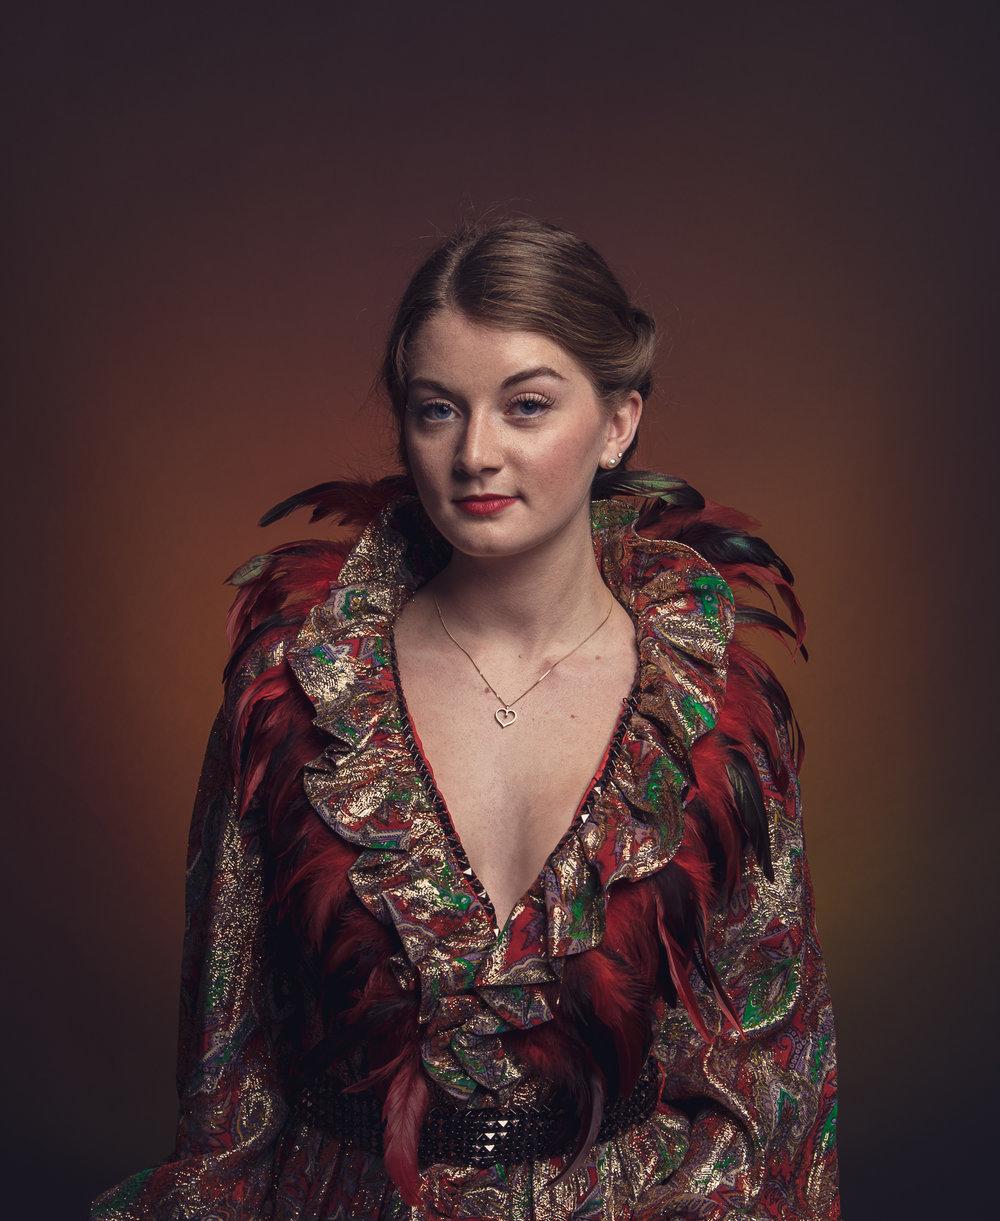 Hamilton Portrait Photographer - Musican Diva 001.JPG